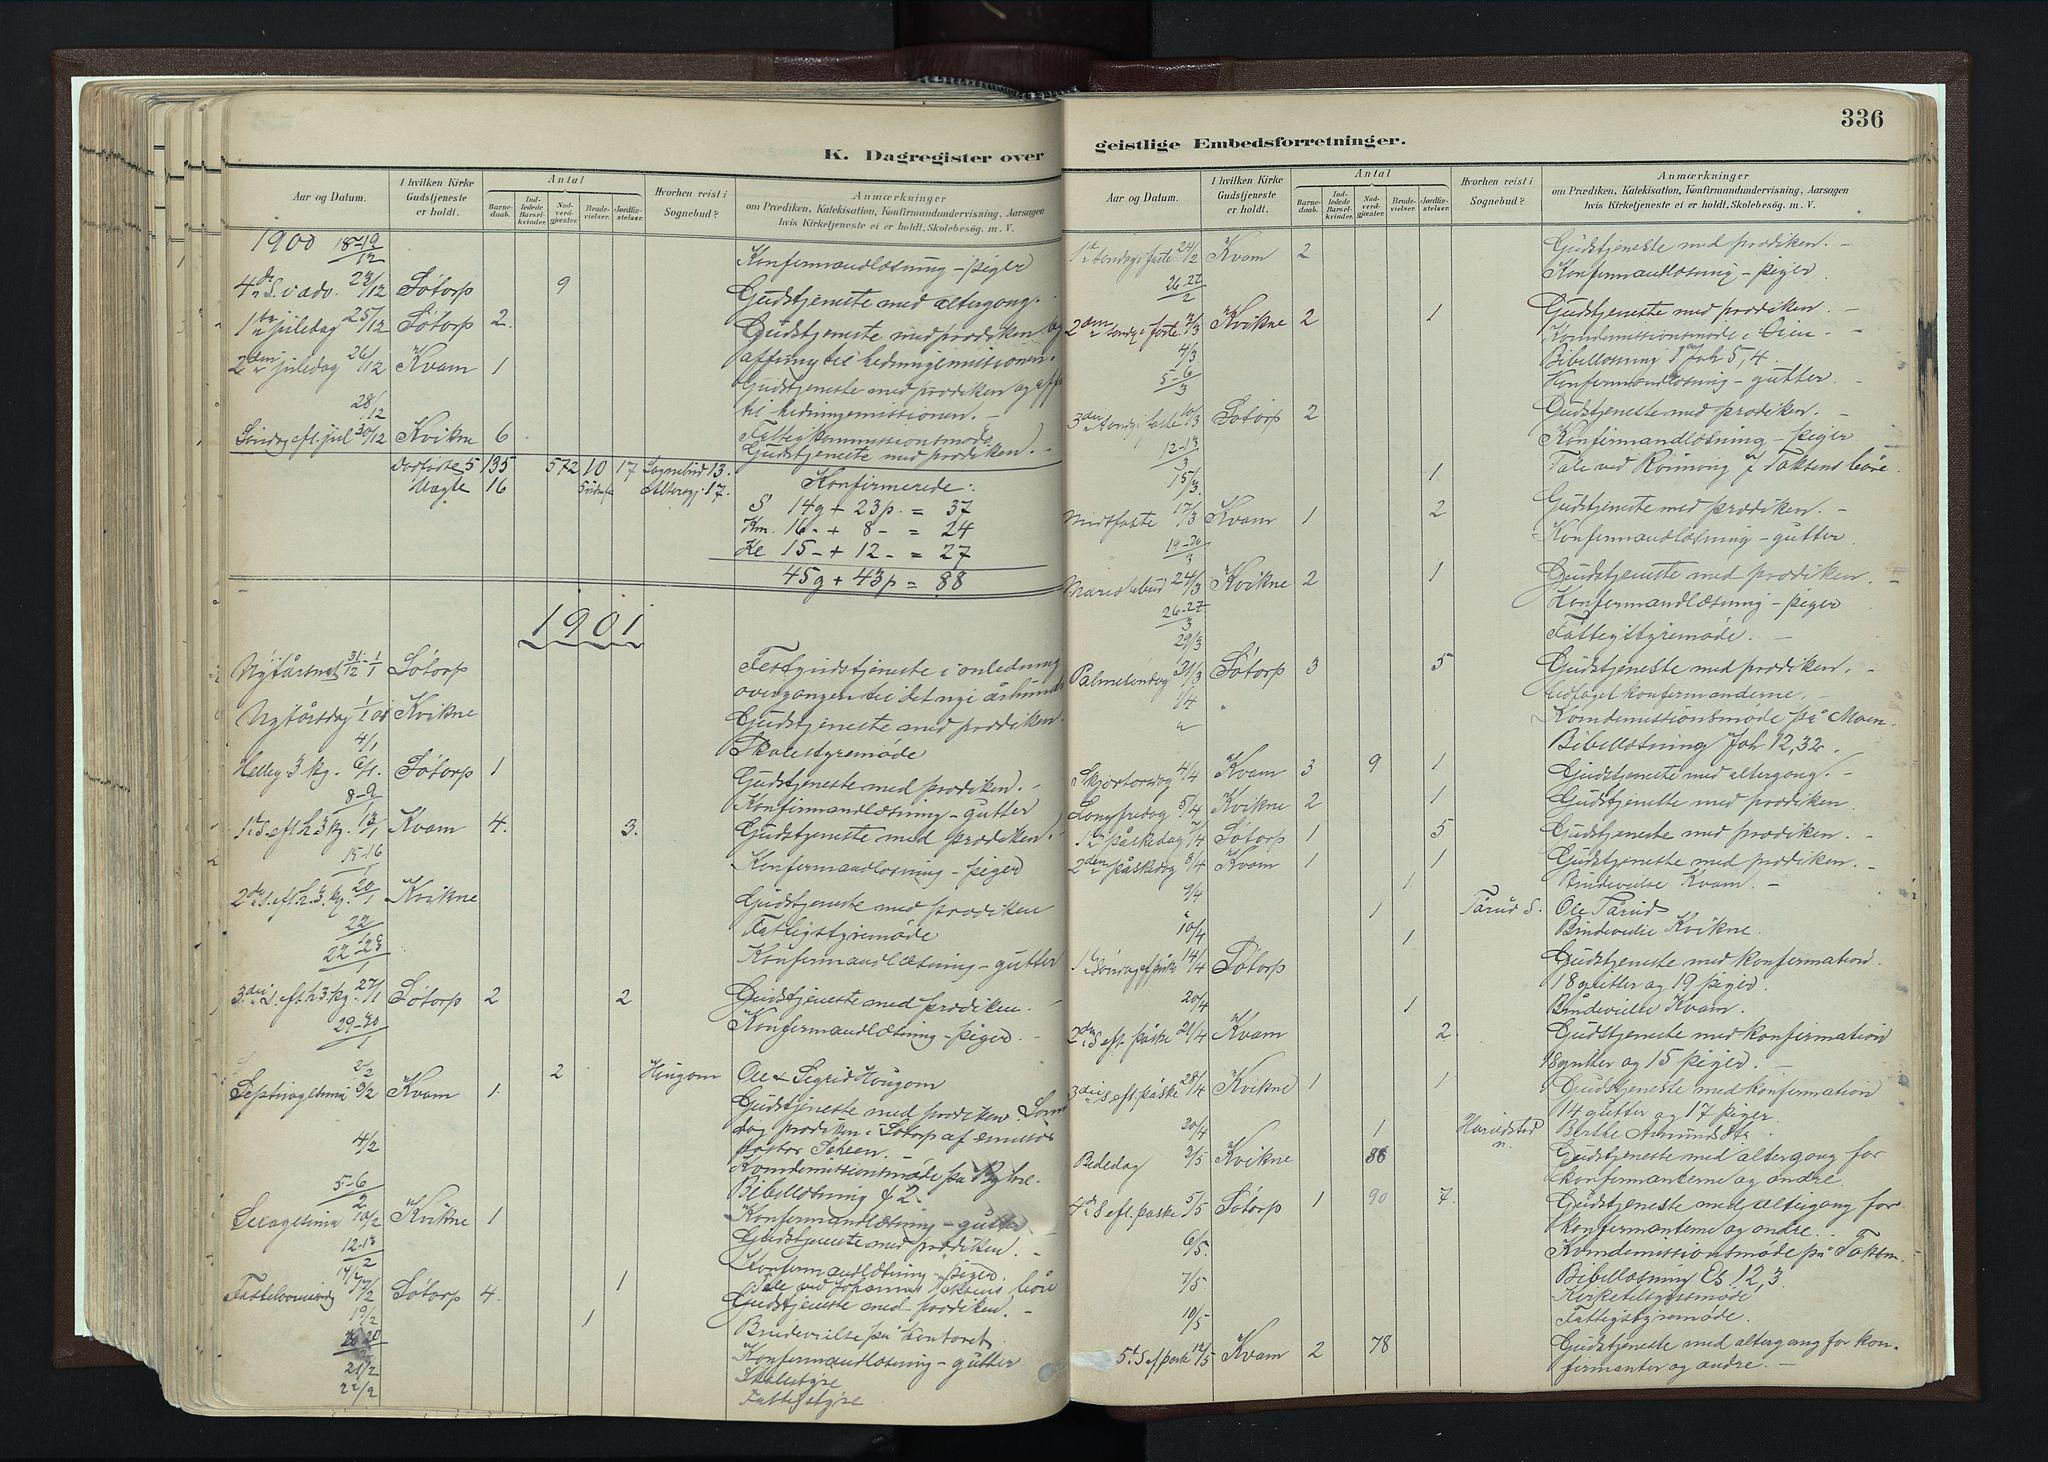 SAH, Nord-Fron prestekontor, Ministerialbok nr. 4, 1884-1914, s. 336